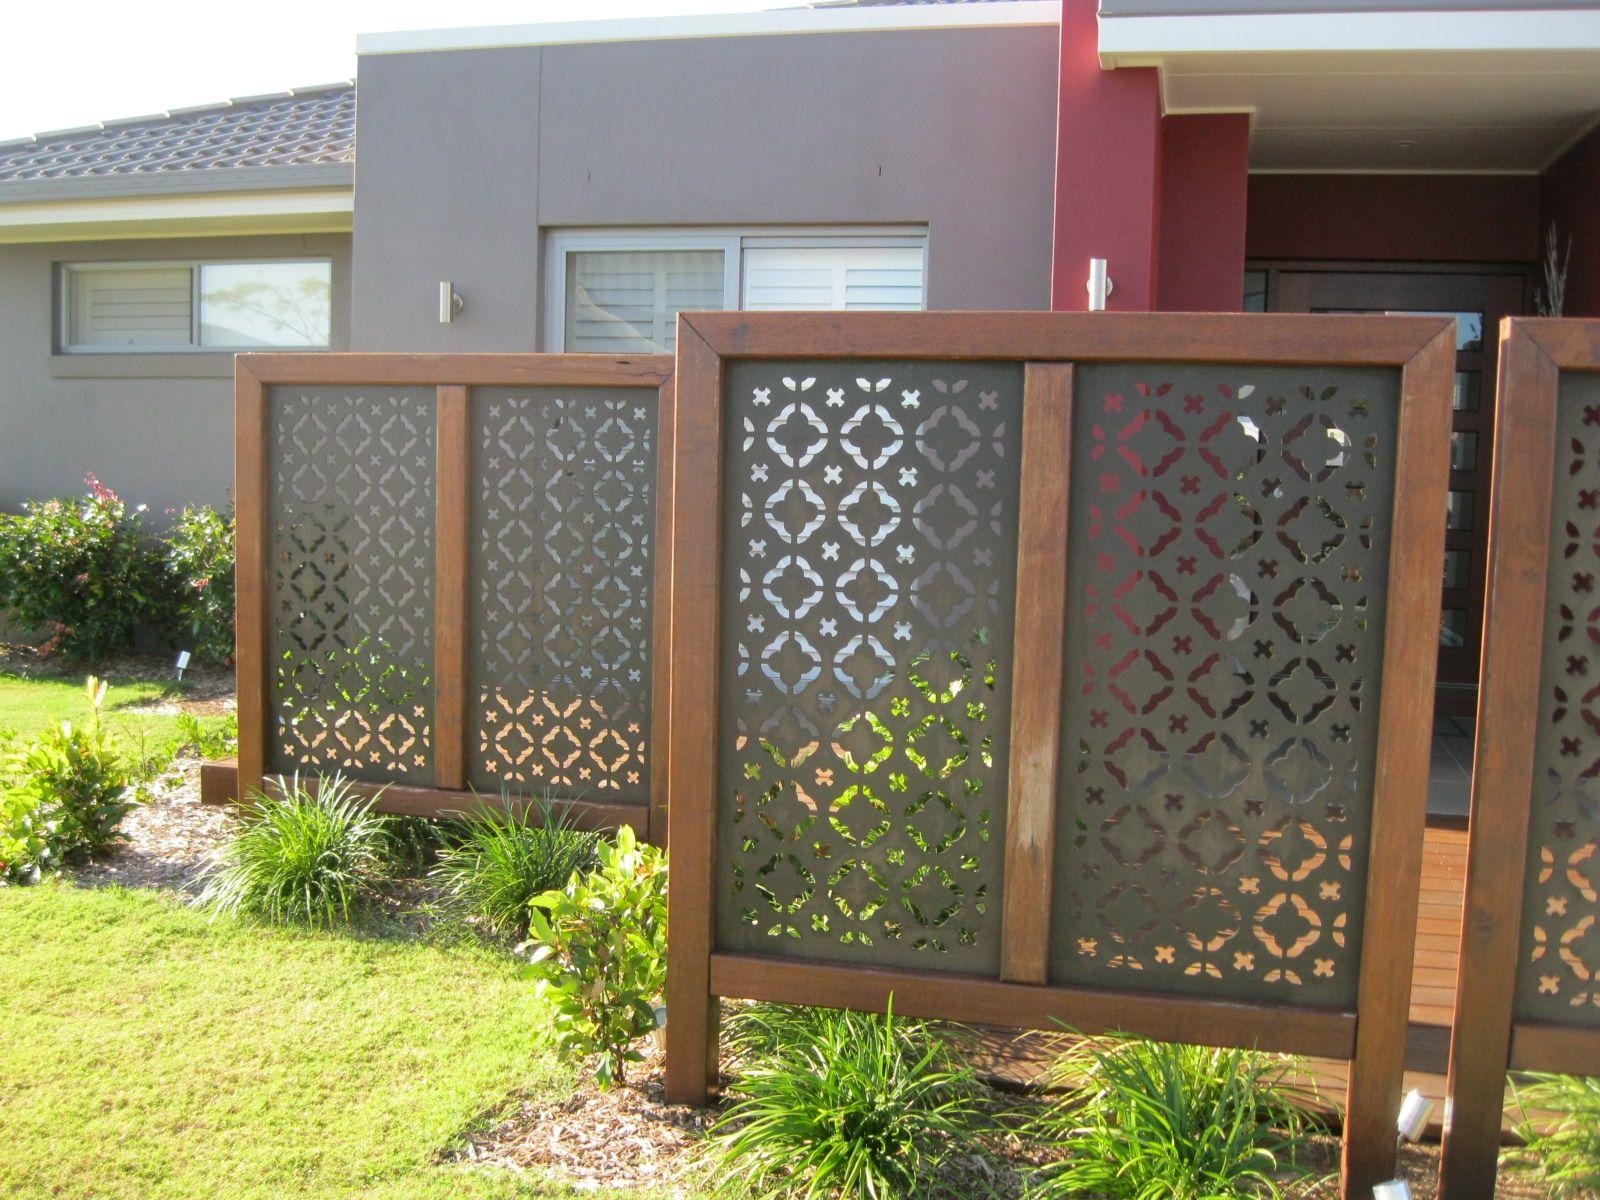 Indoor Outdoor Patio Furniture Creative Outdoor Privacy Screens Backyard Privacy Screen Garden Privacy Screen Backyard Privacy